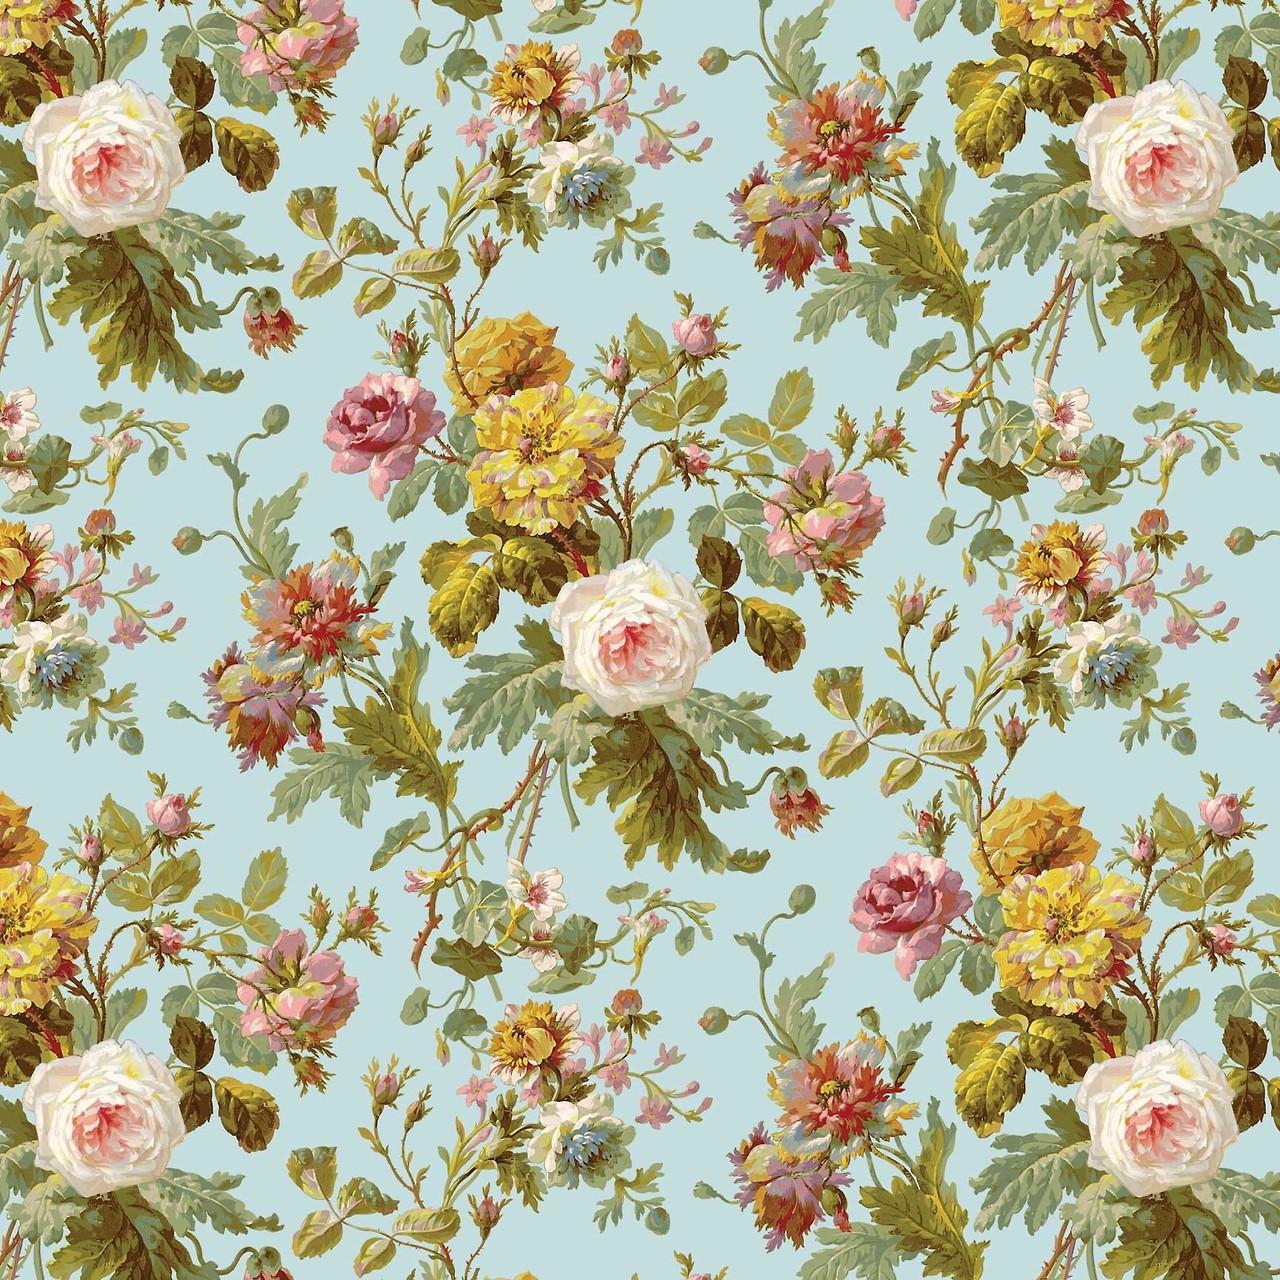 Download Vintage Floral Wallpaper Pattern Cool Hd Wallpapers